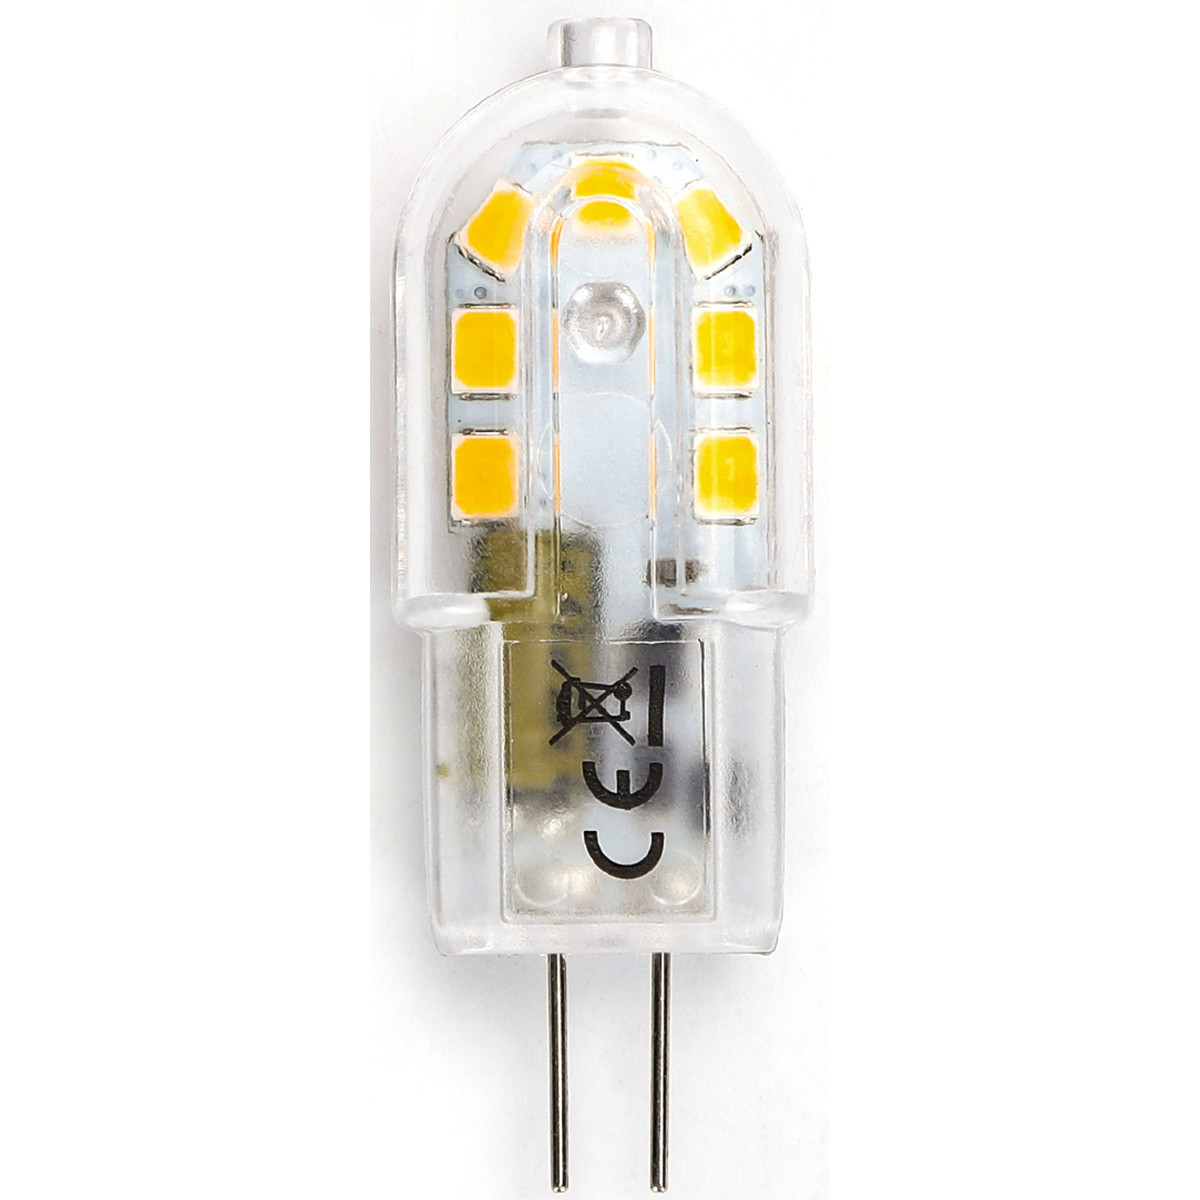 LED Lamp - Aigi - G4 Fitting - 2W - Helder/Koud Wit 6500K | Vervangt 20W